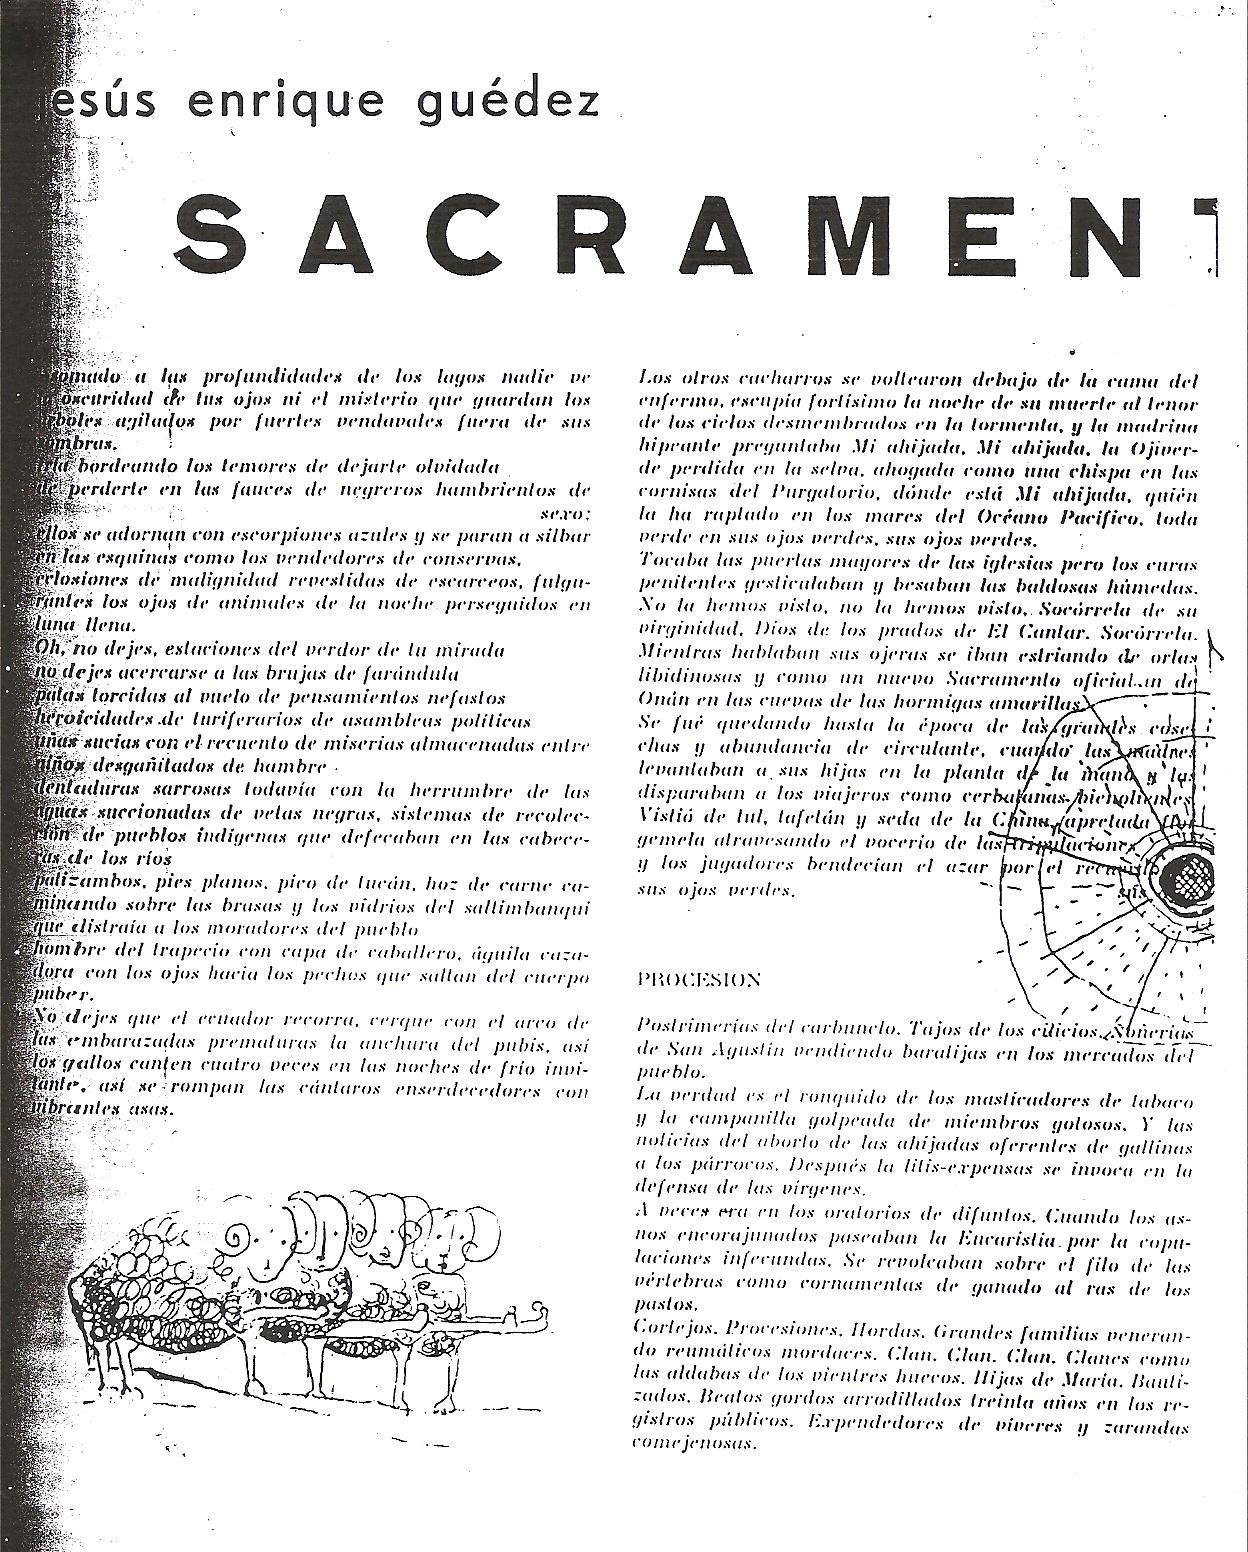 Sacramental 7